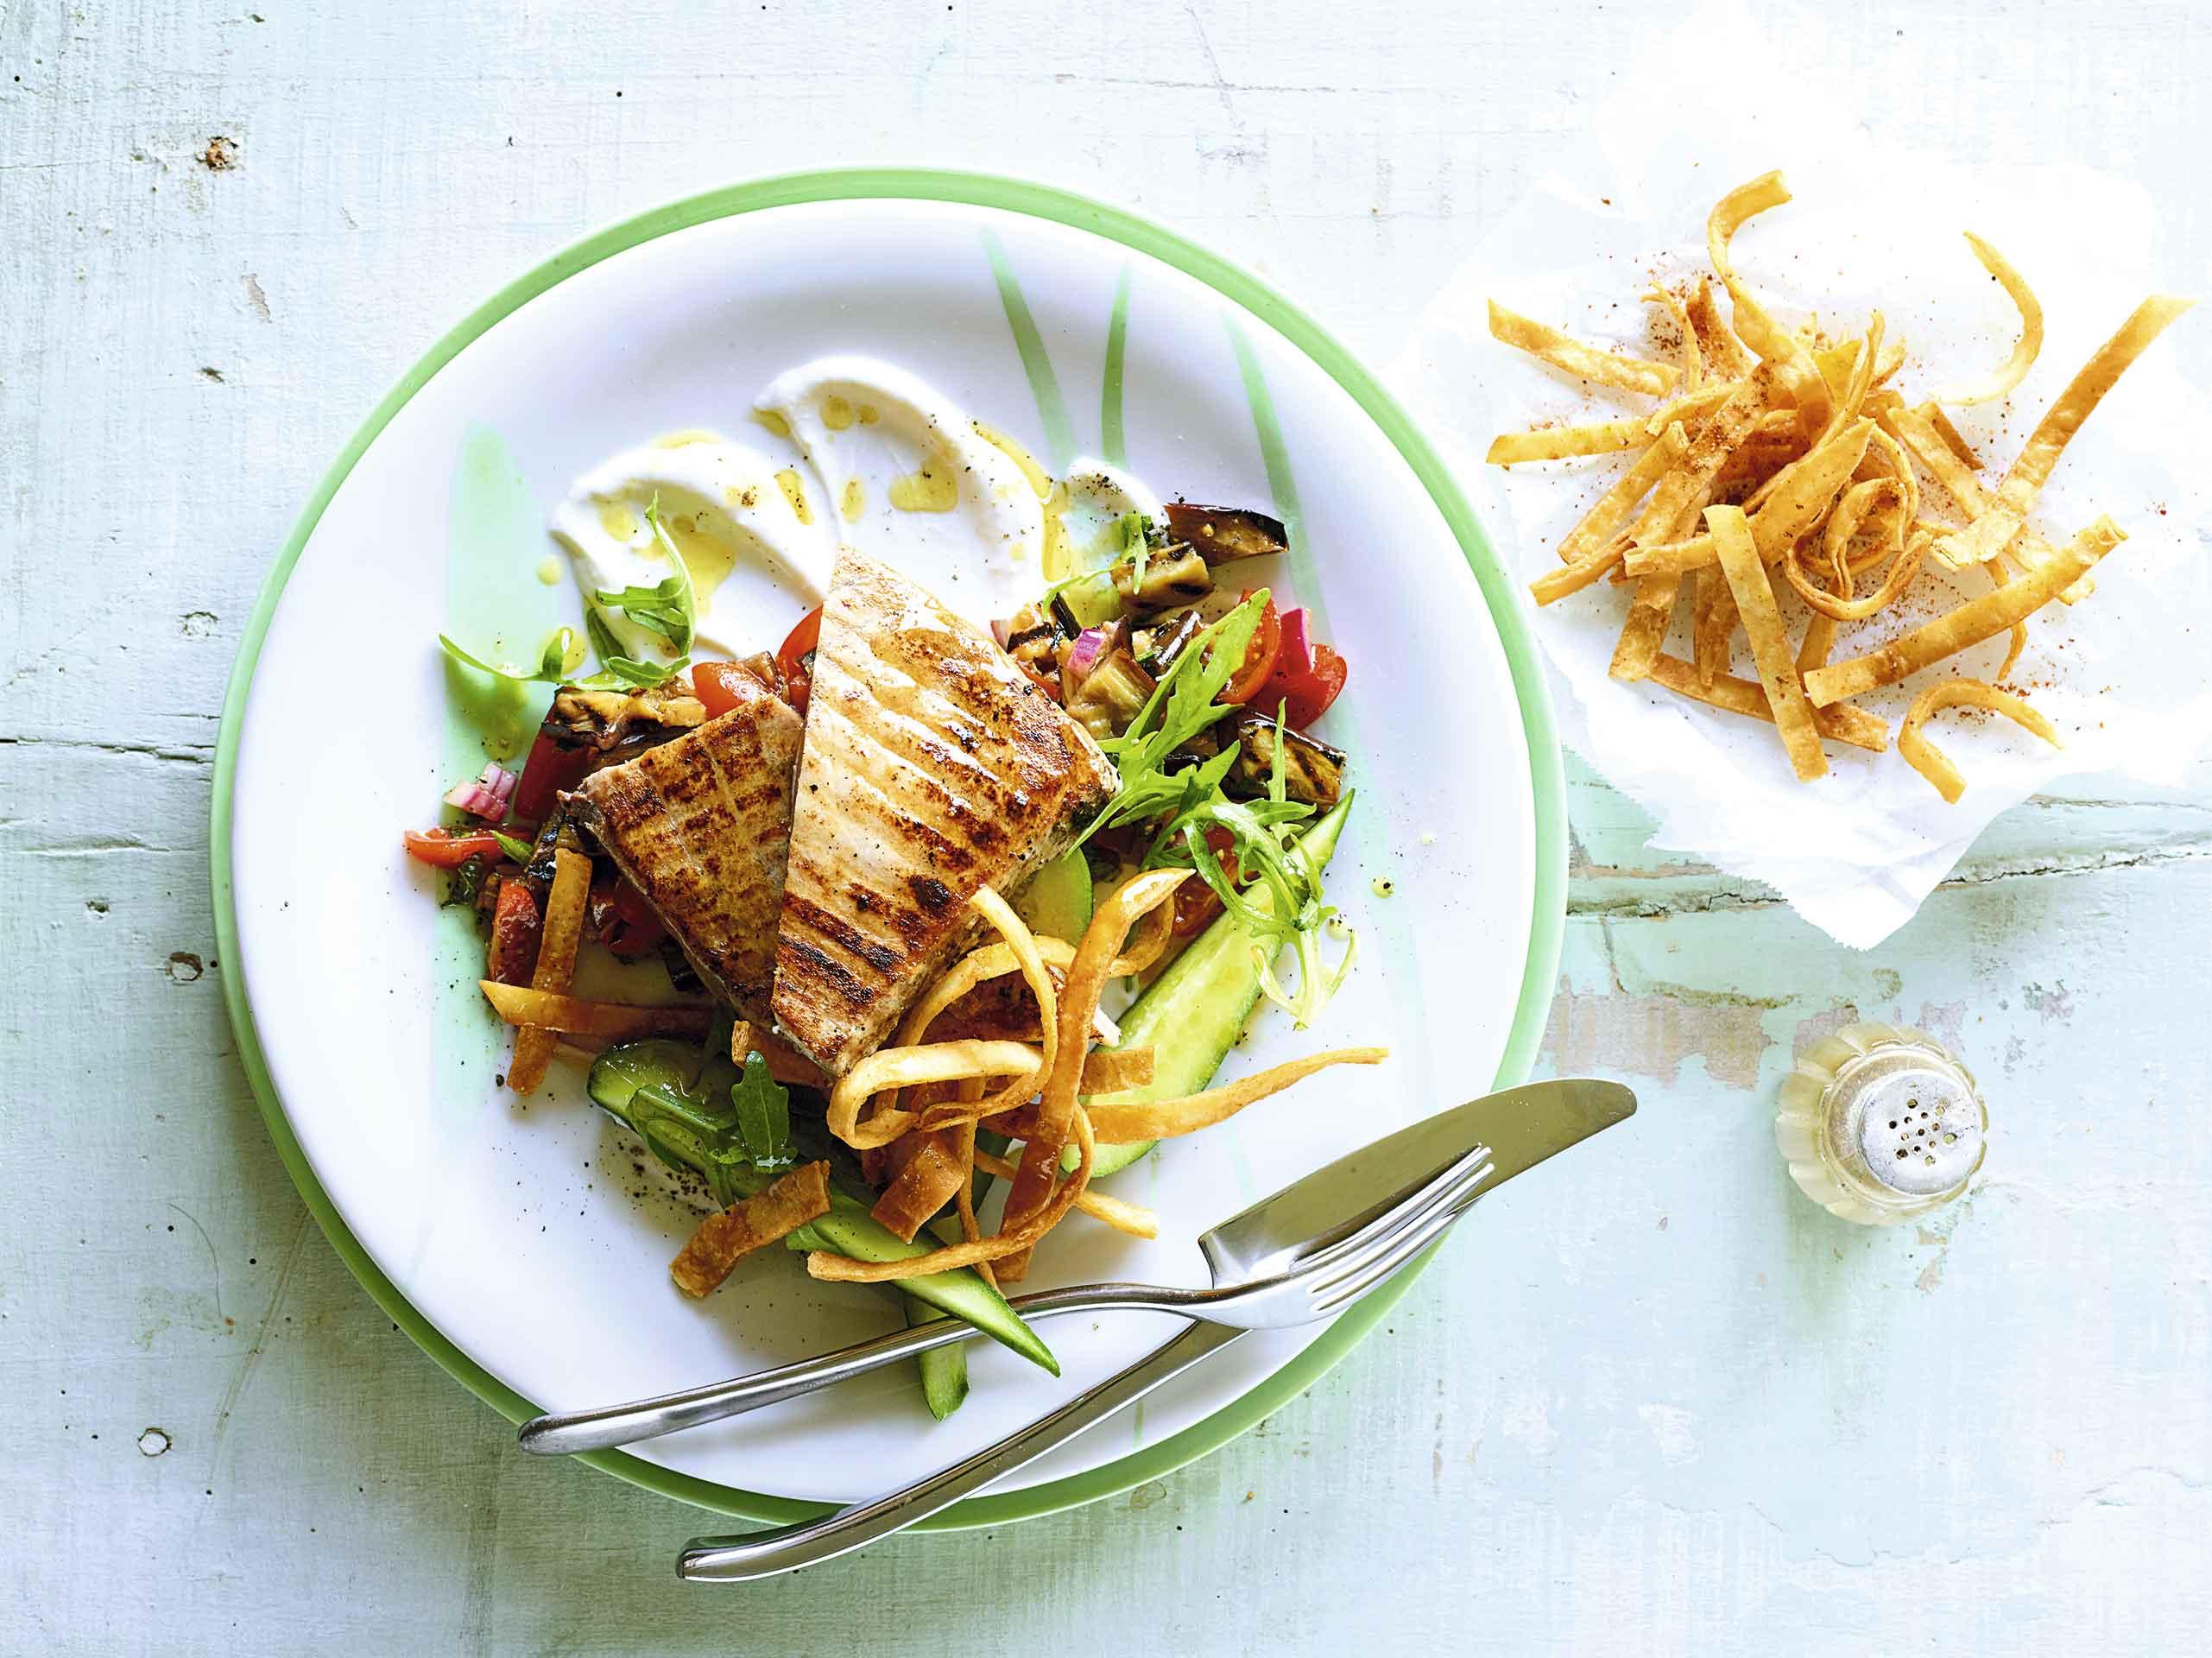 Ensalada de atún con frituras de pan pita, arúgula y salsa de berenjena